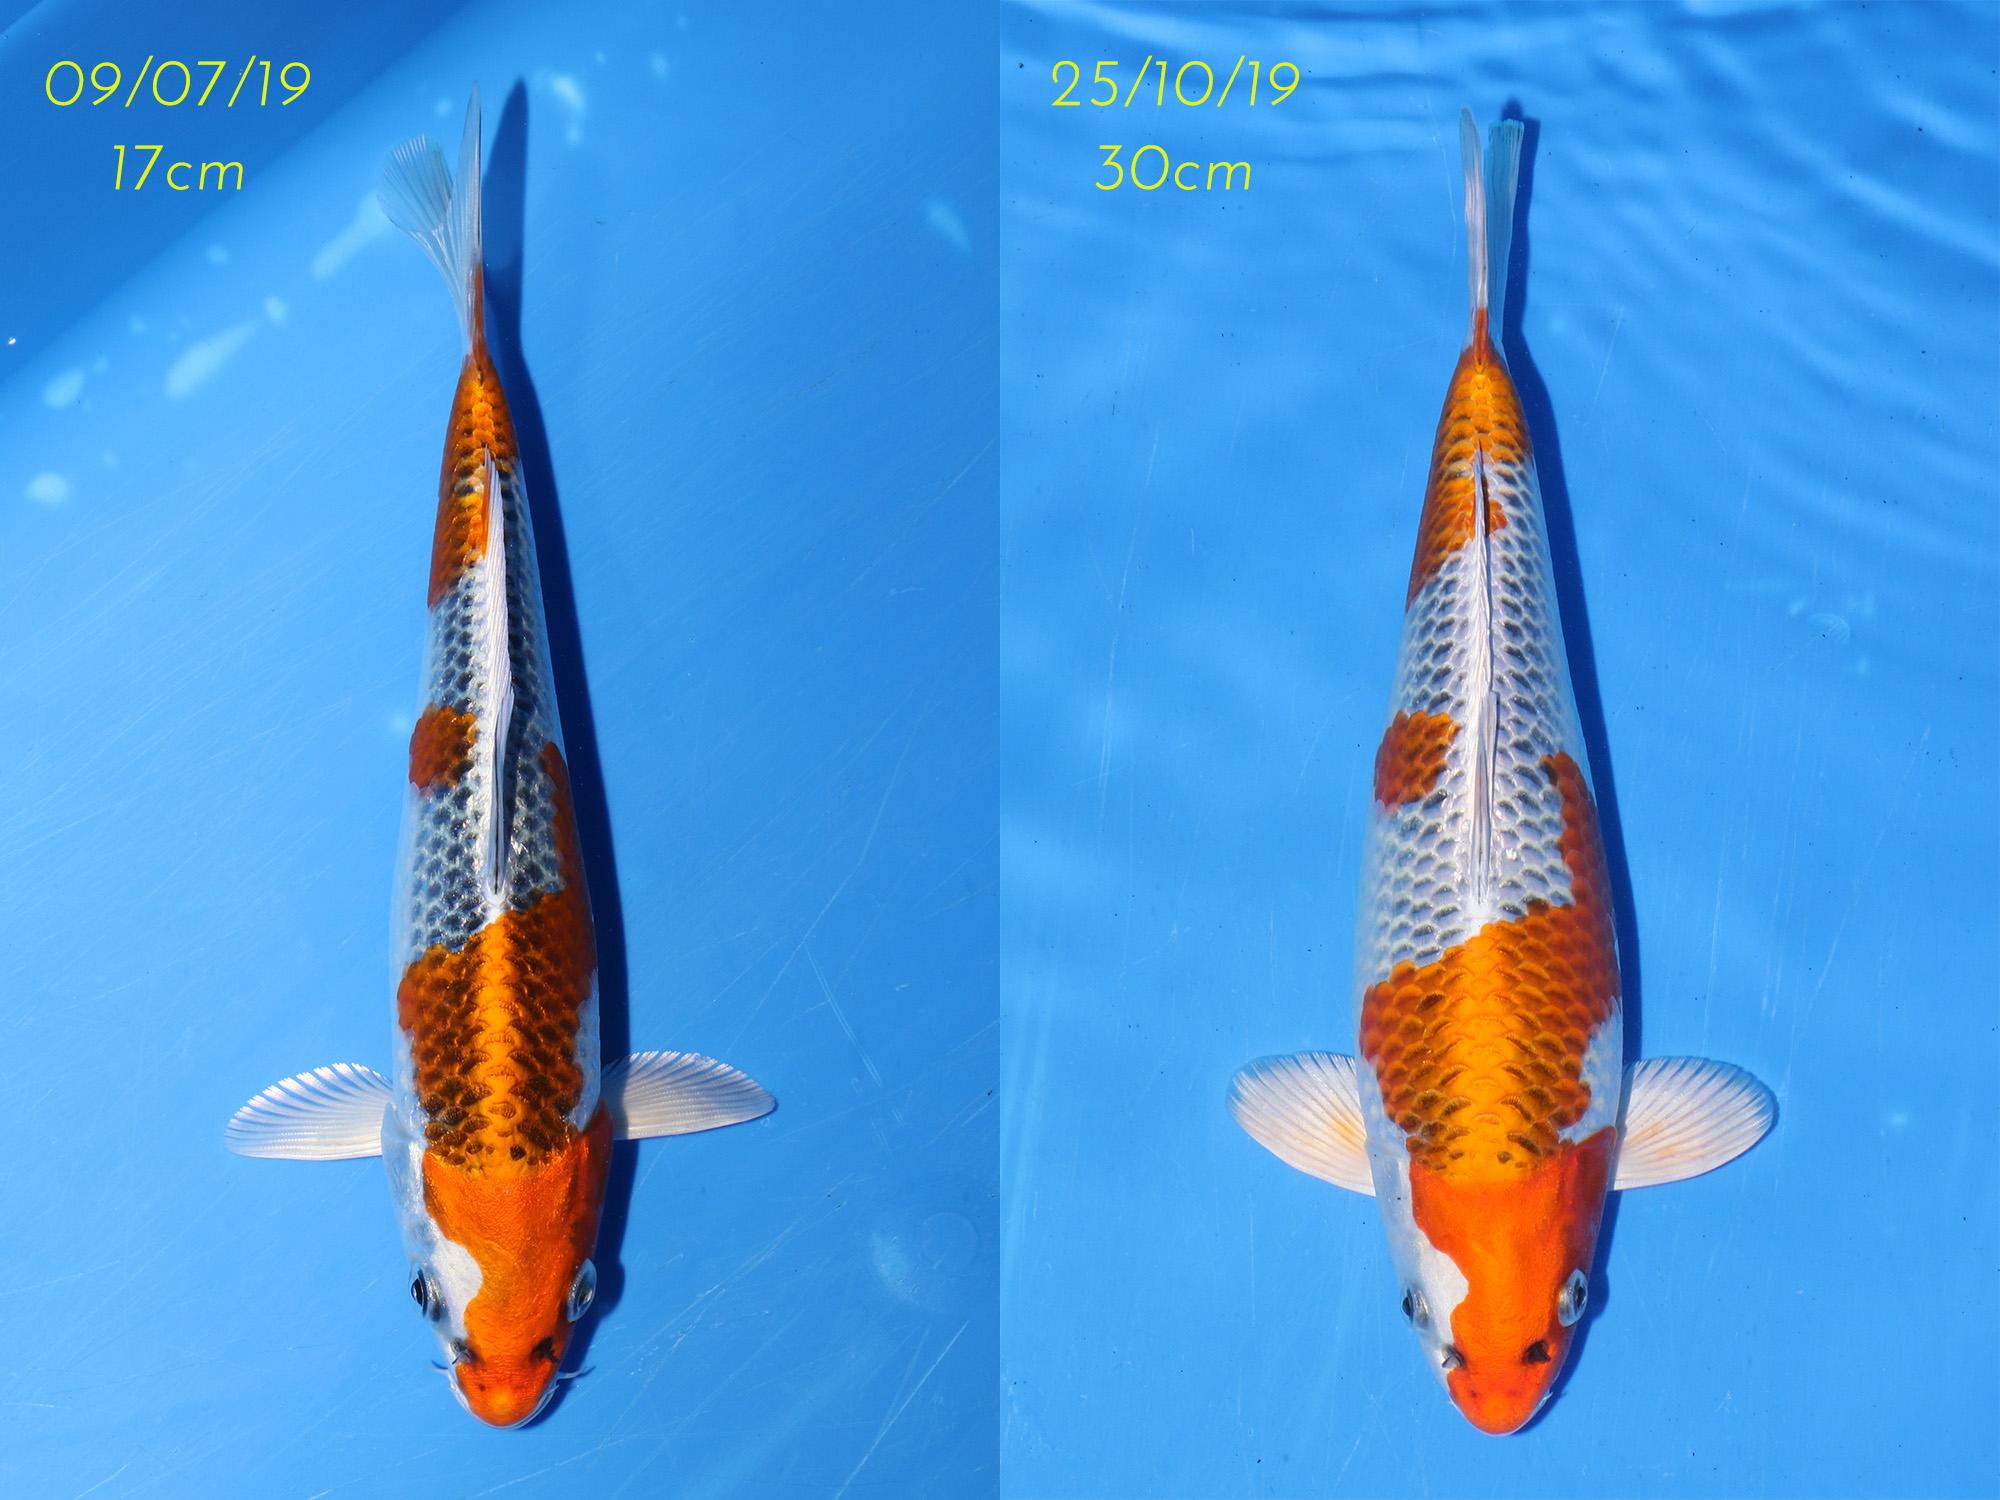 Kujaku_2_Comparison.jpg